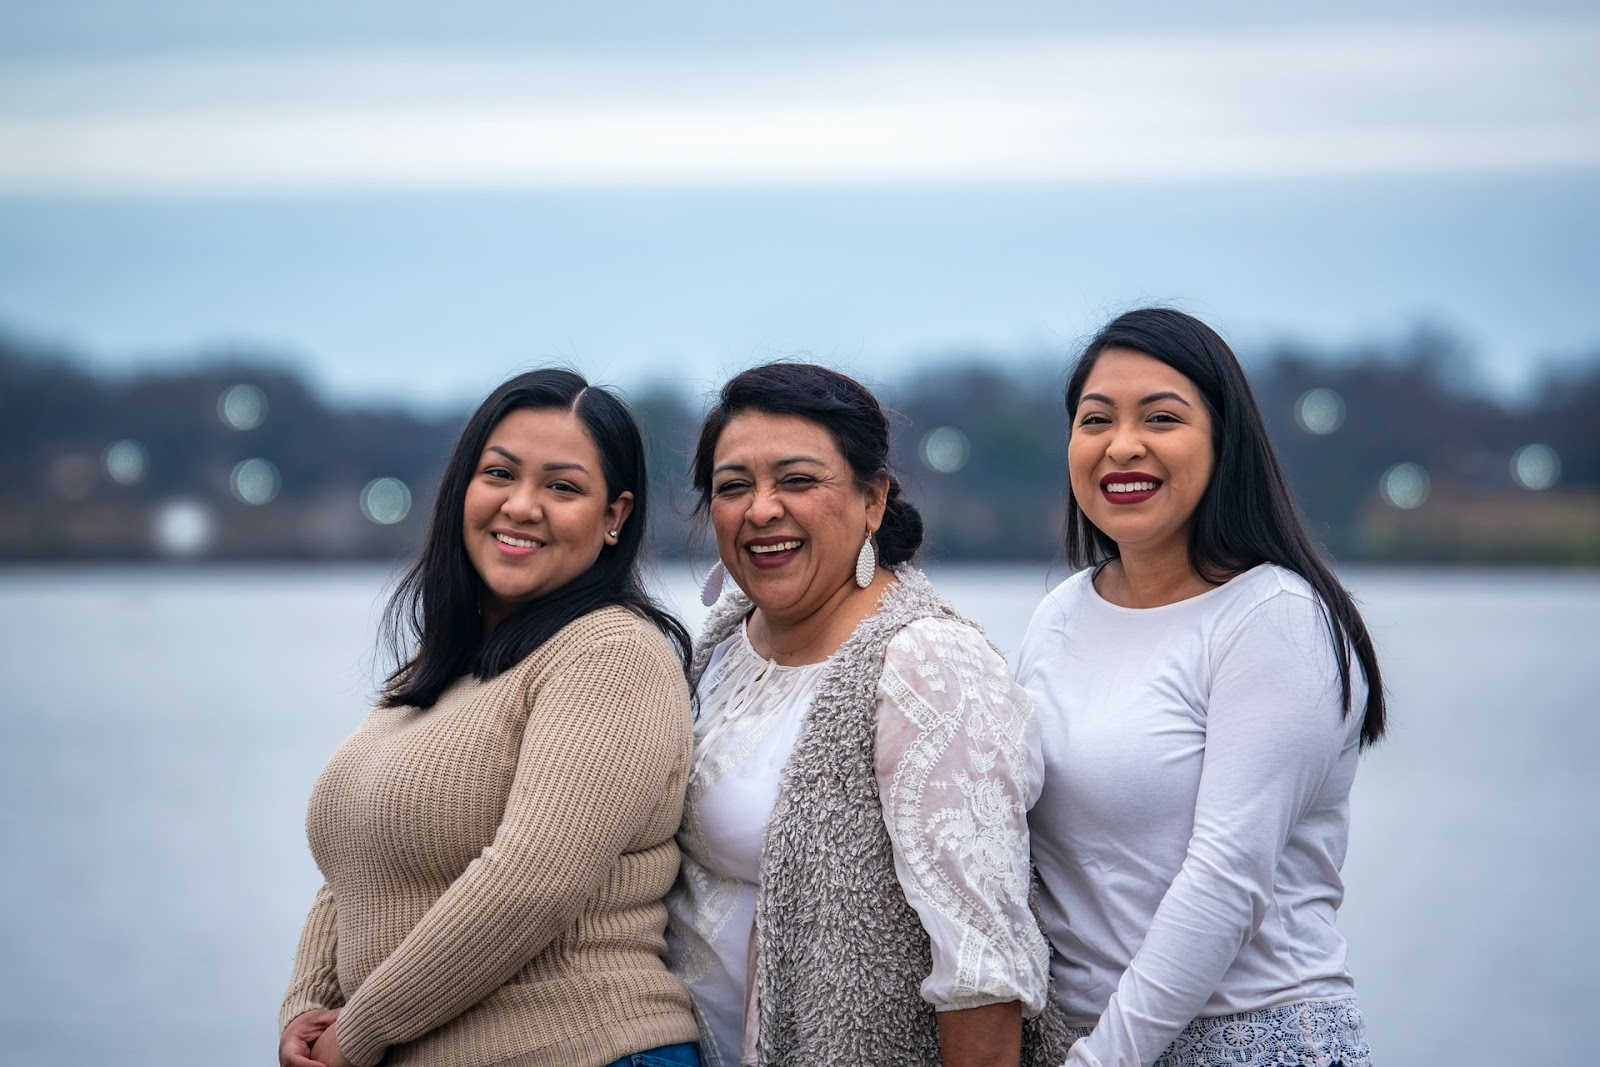 portrait photography three women